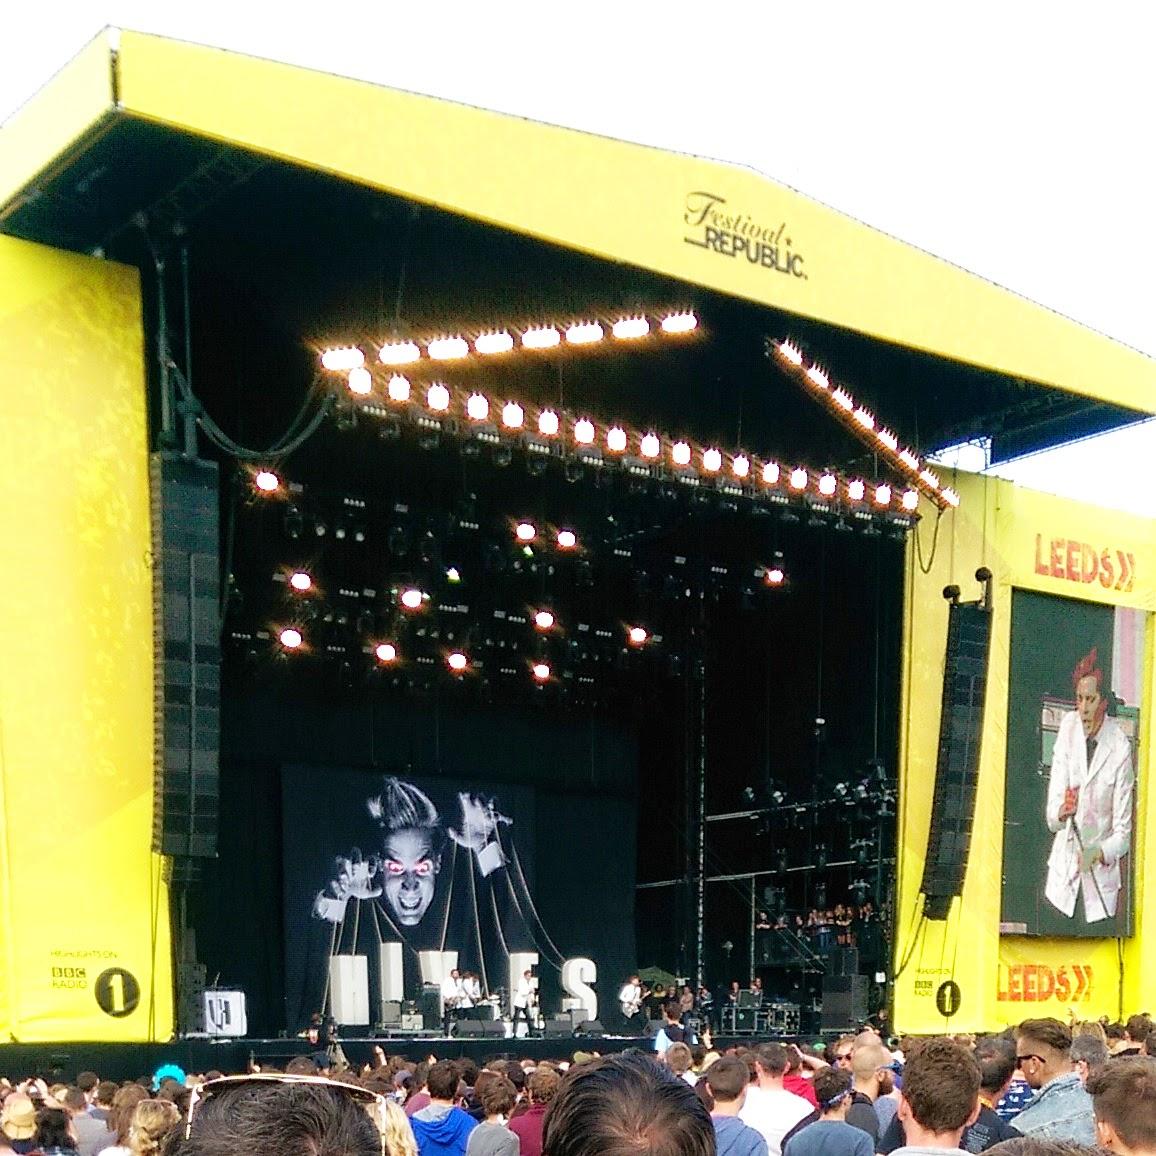 Leeds Festival 2014 Roundup